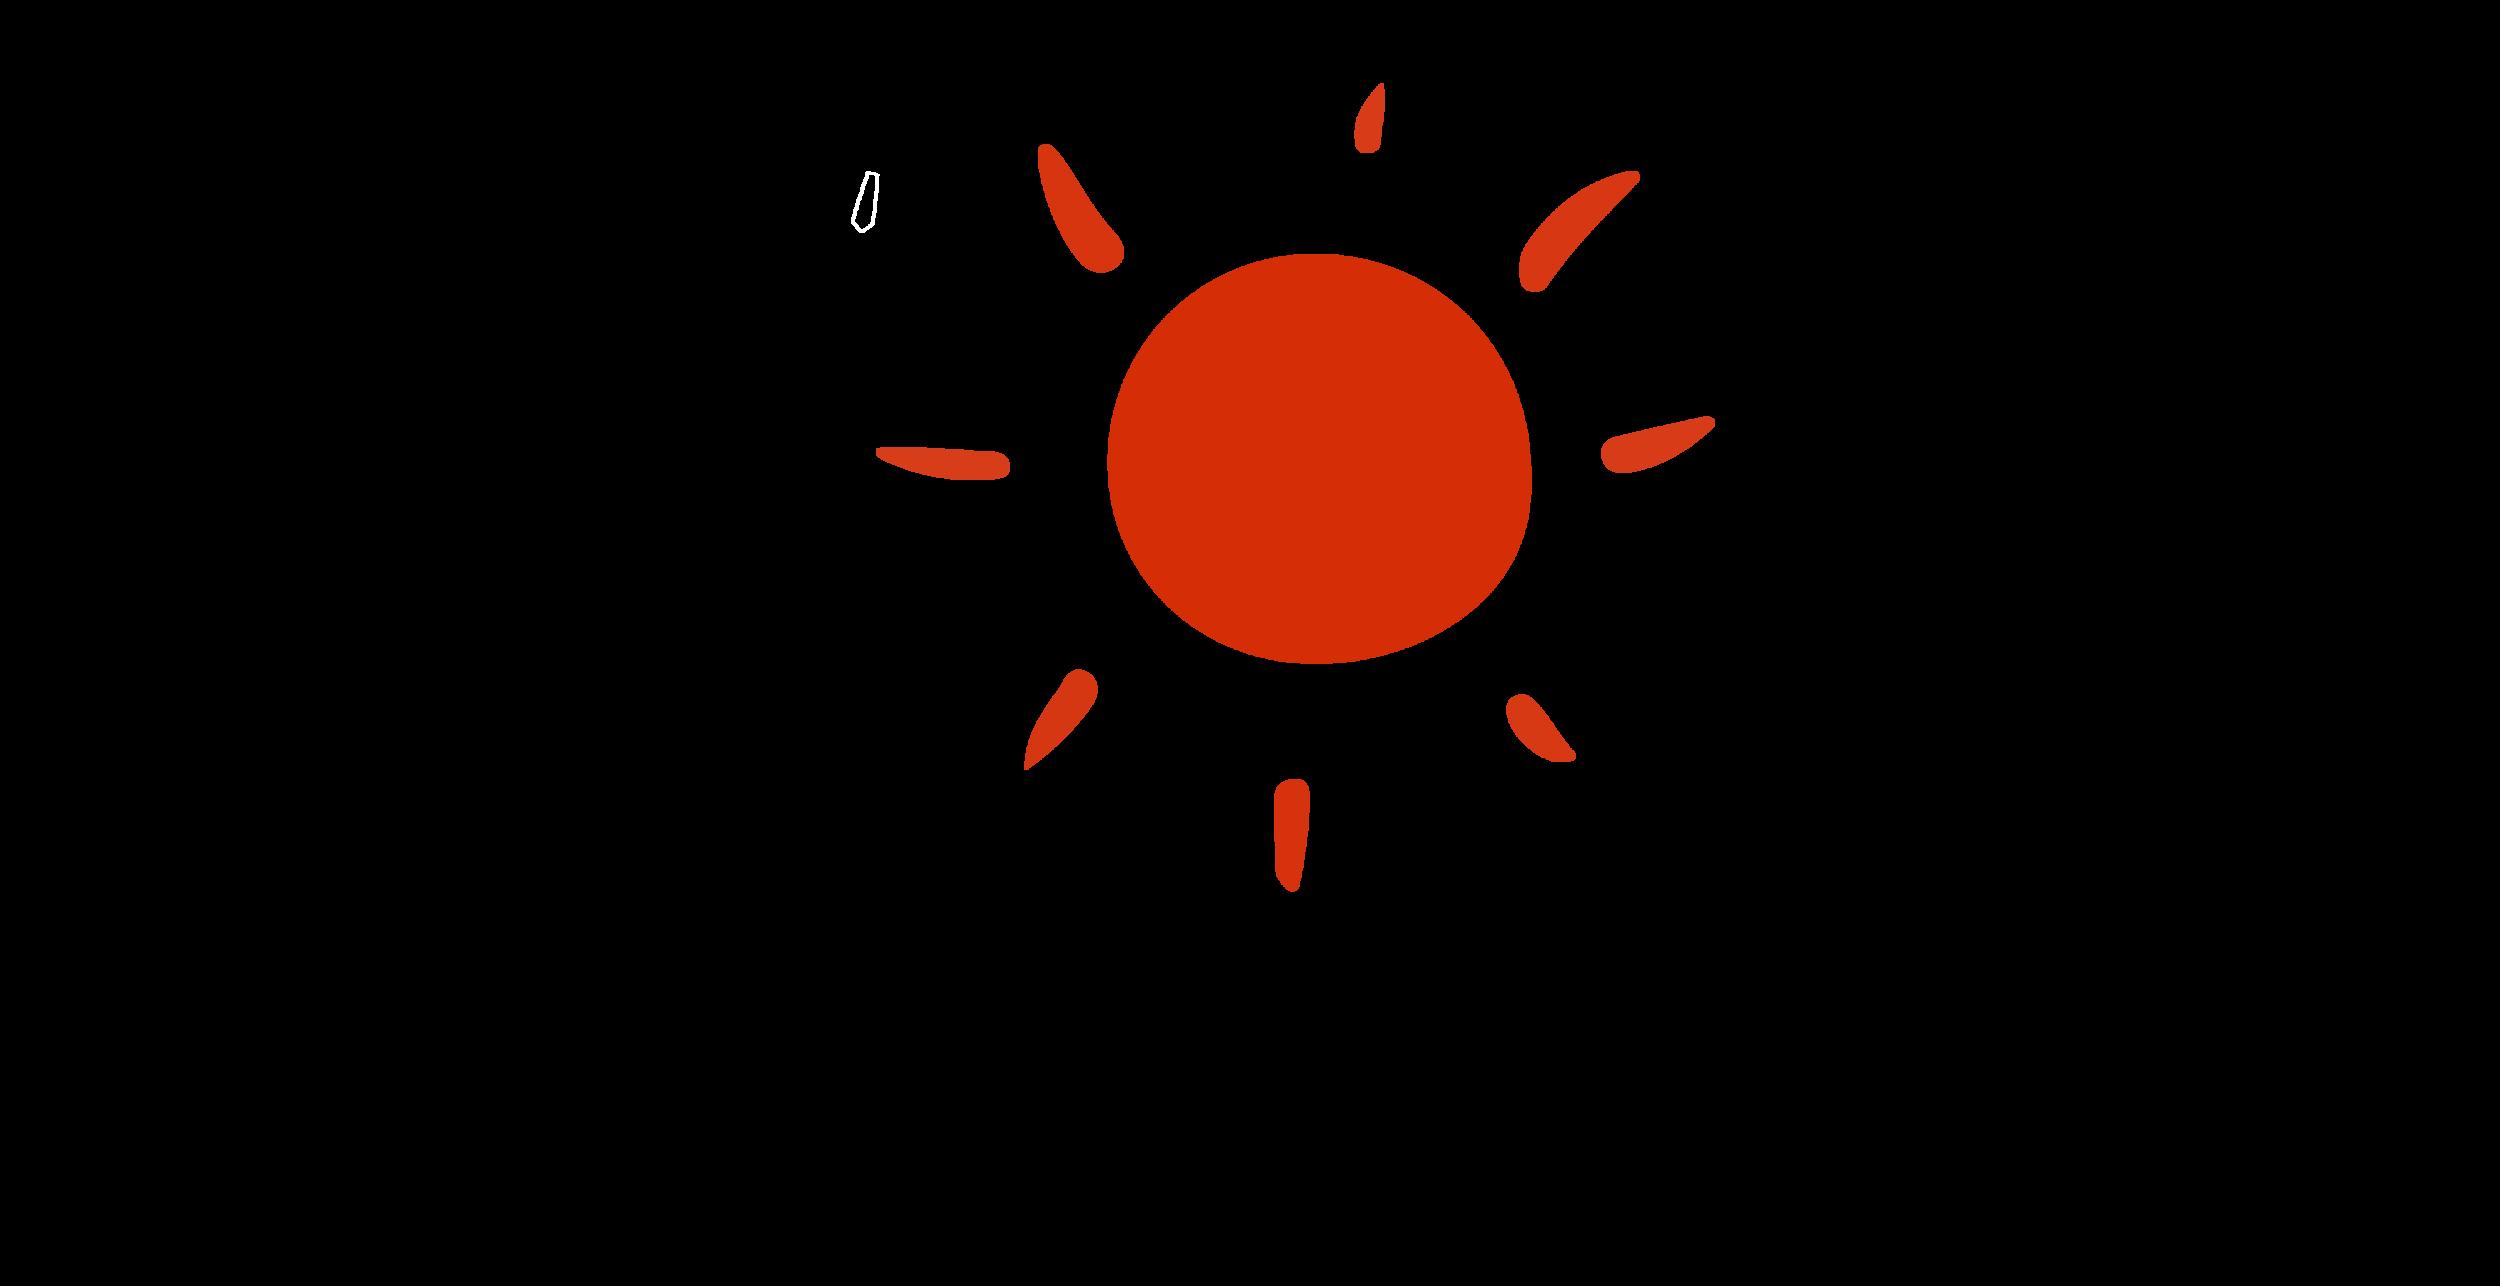 BIG-SIMPLE-SUN-1.png